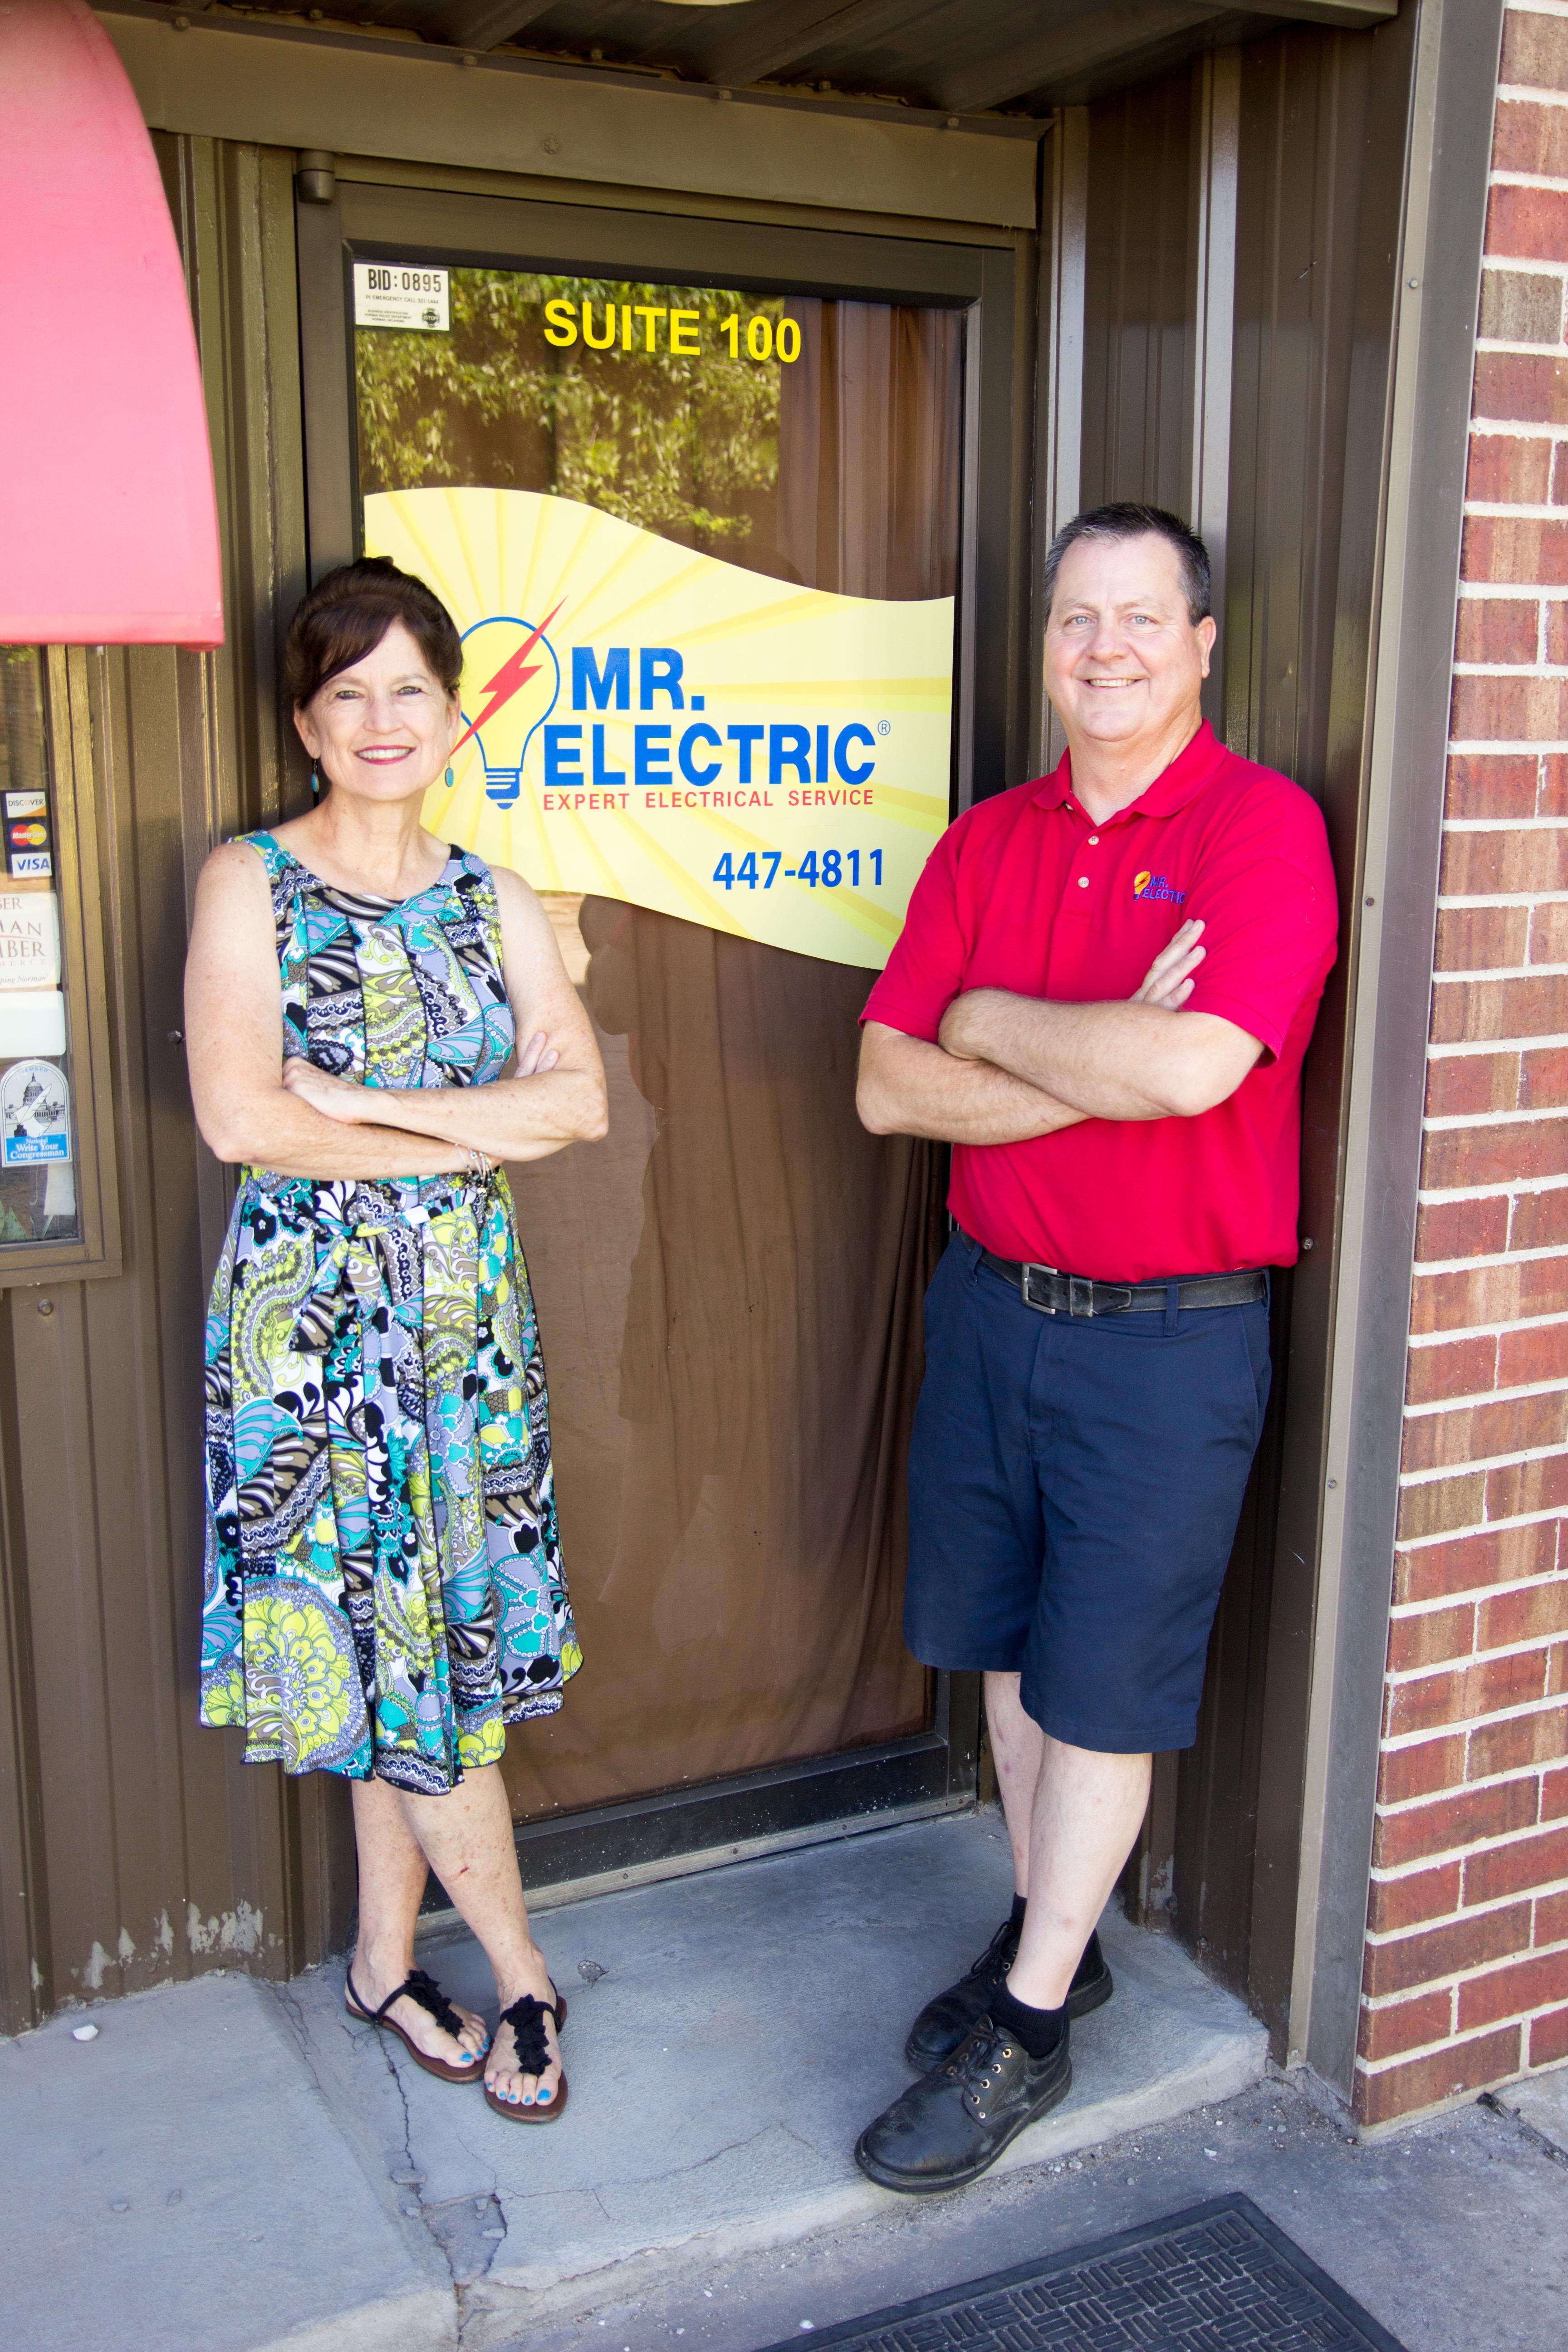 Mr. Electric image 2